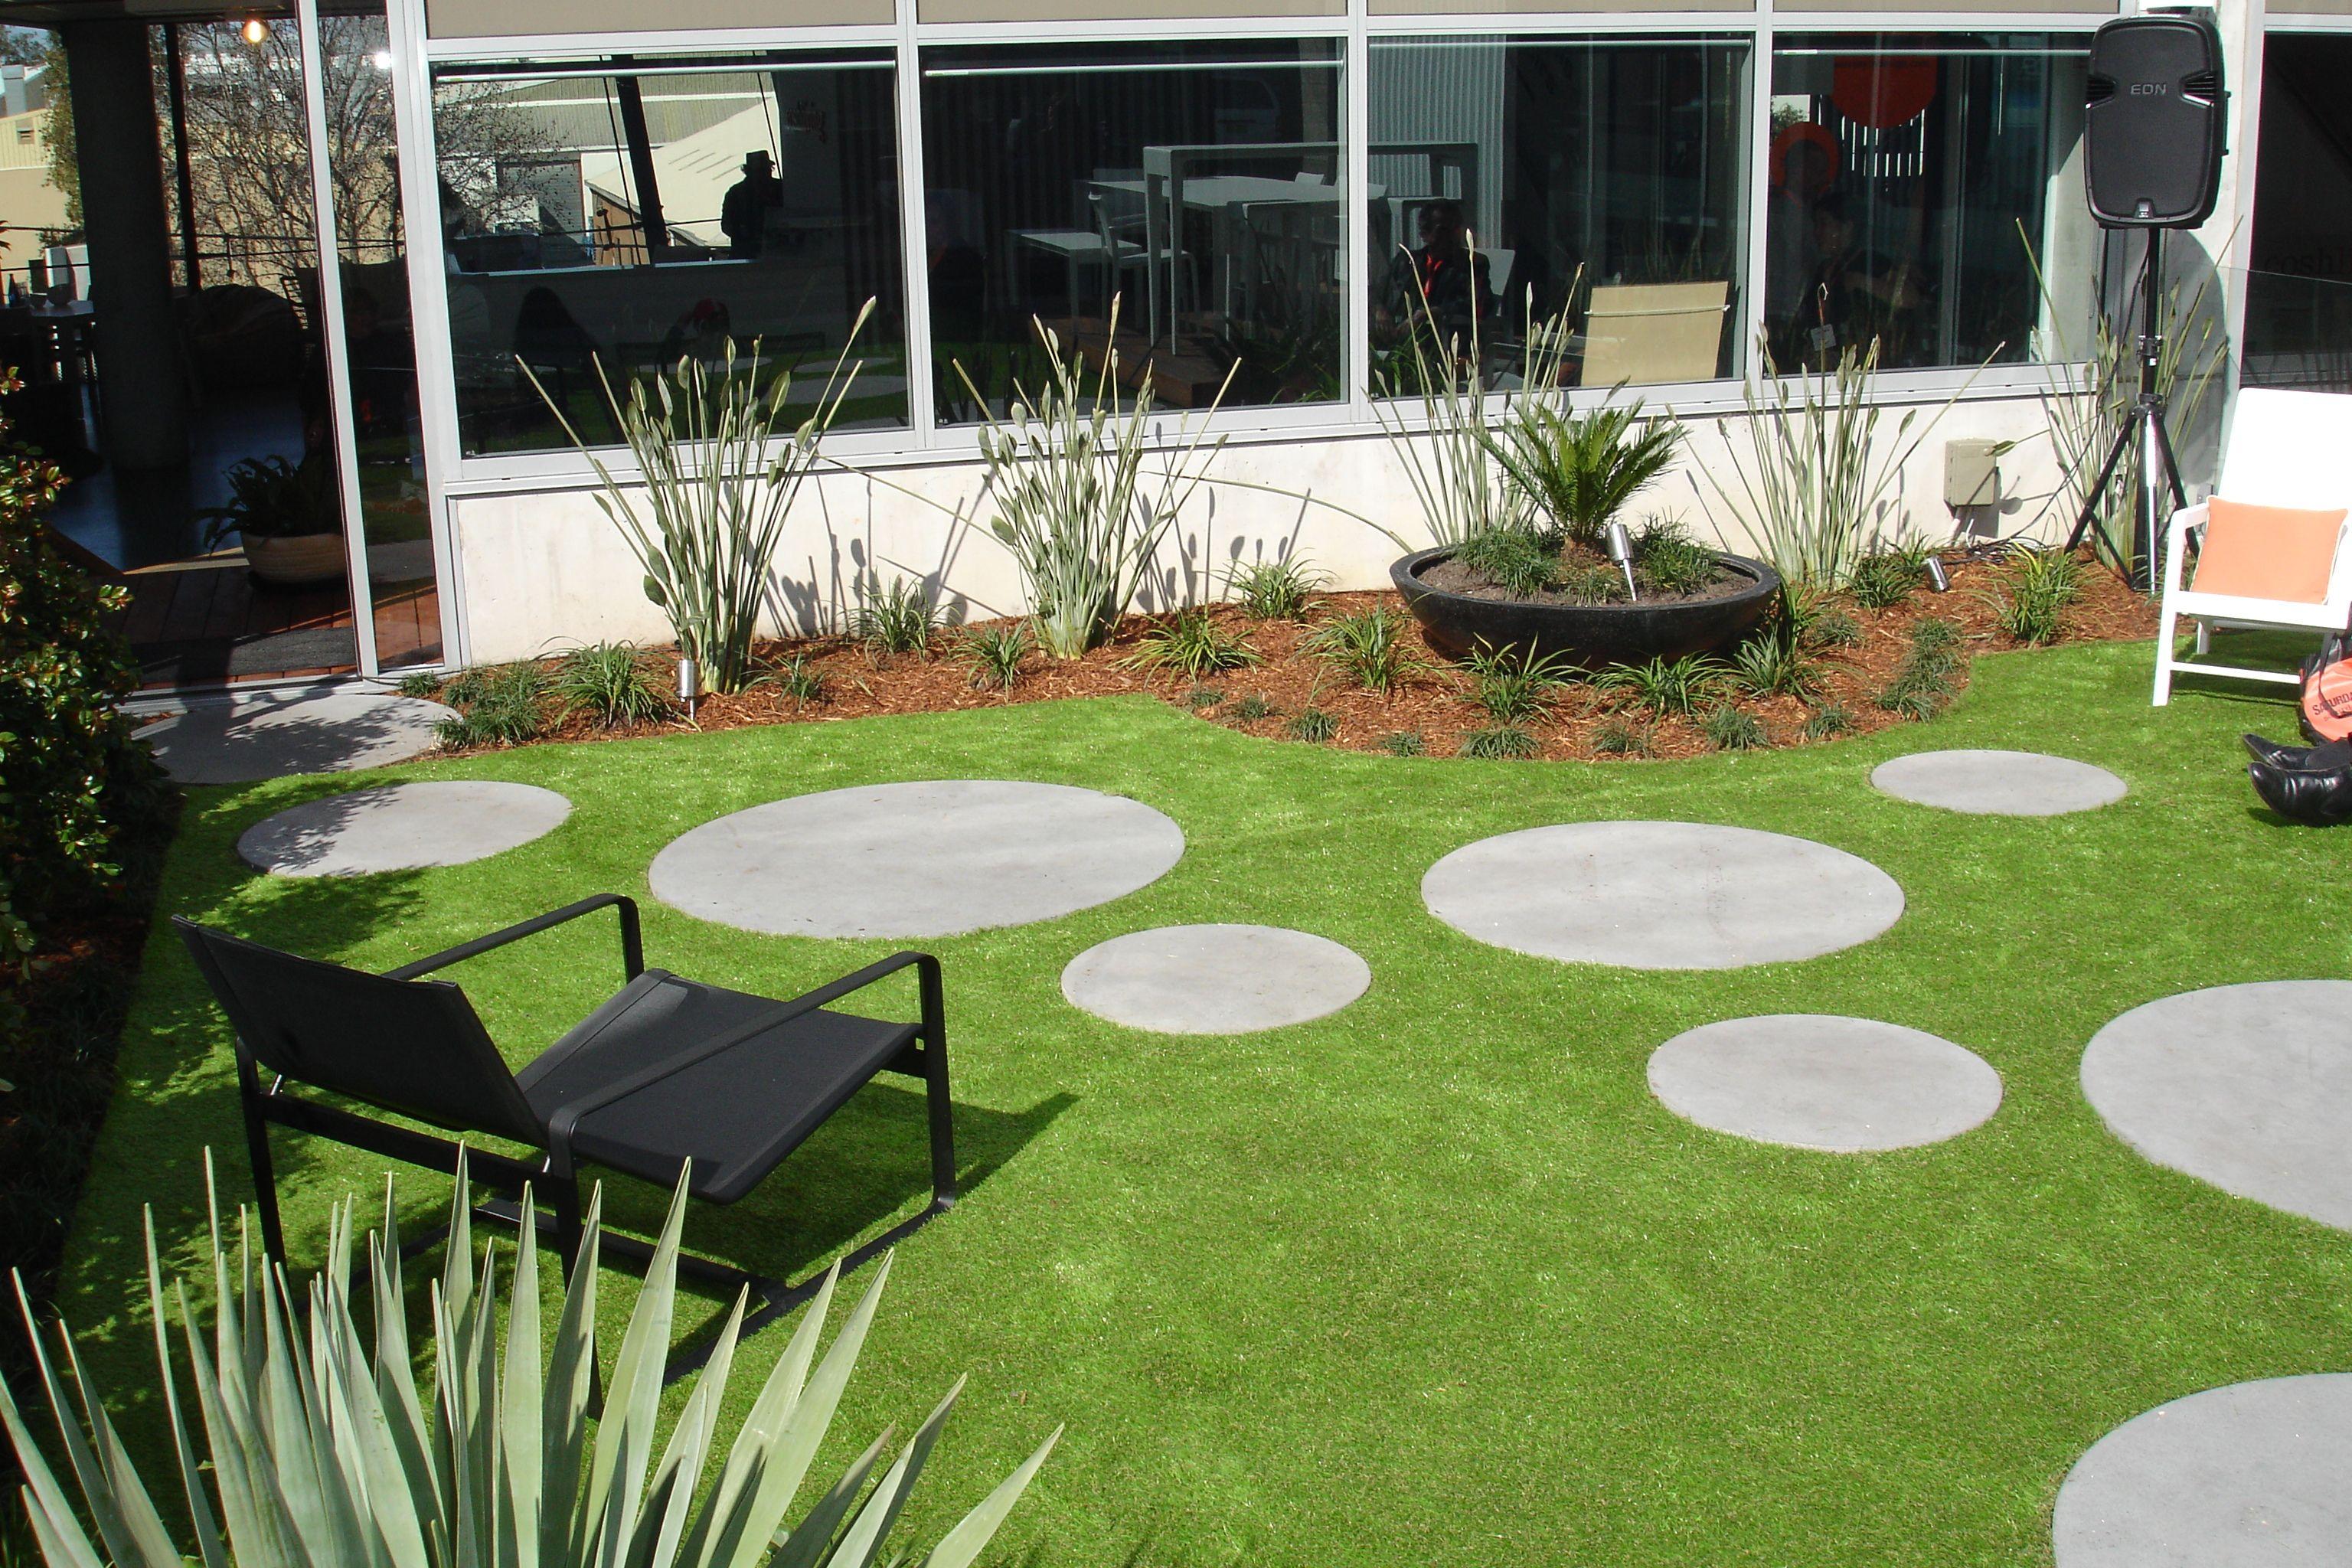 Circular Pavers Fake Lawn Ideas For The Garden Pinterest